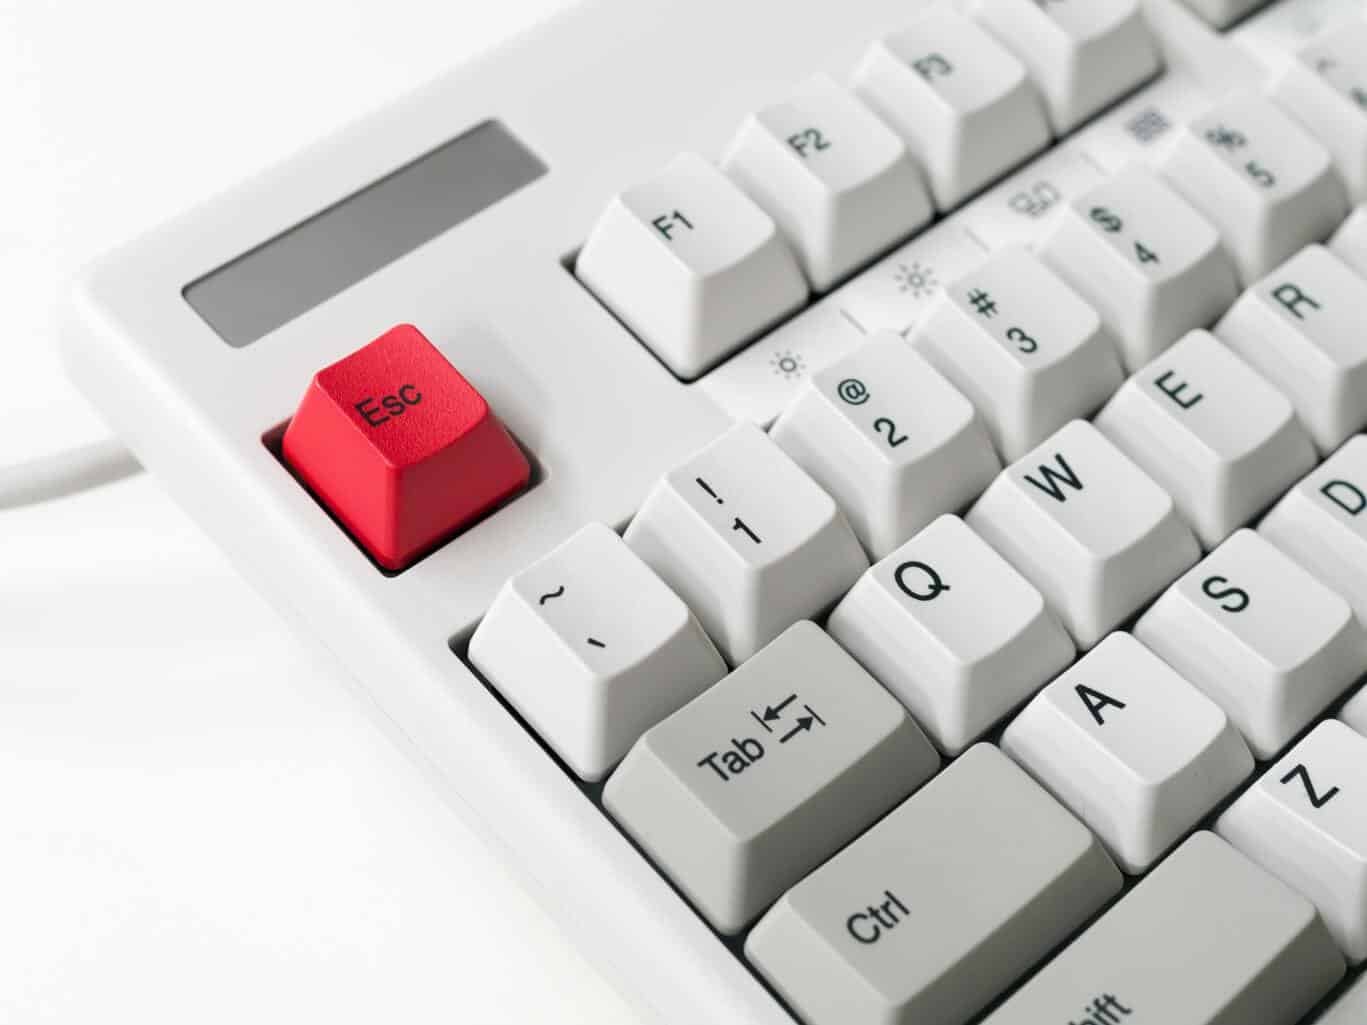 red escape button on computer